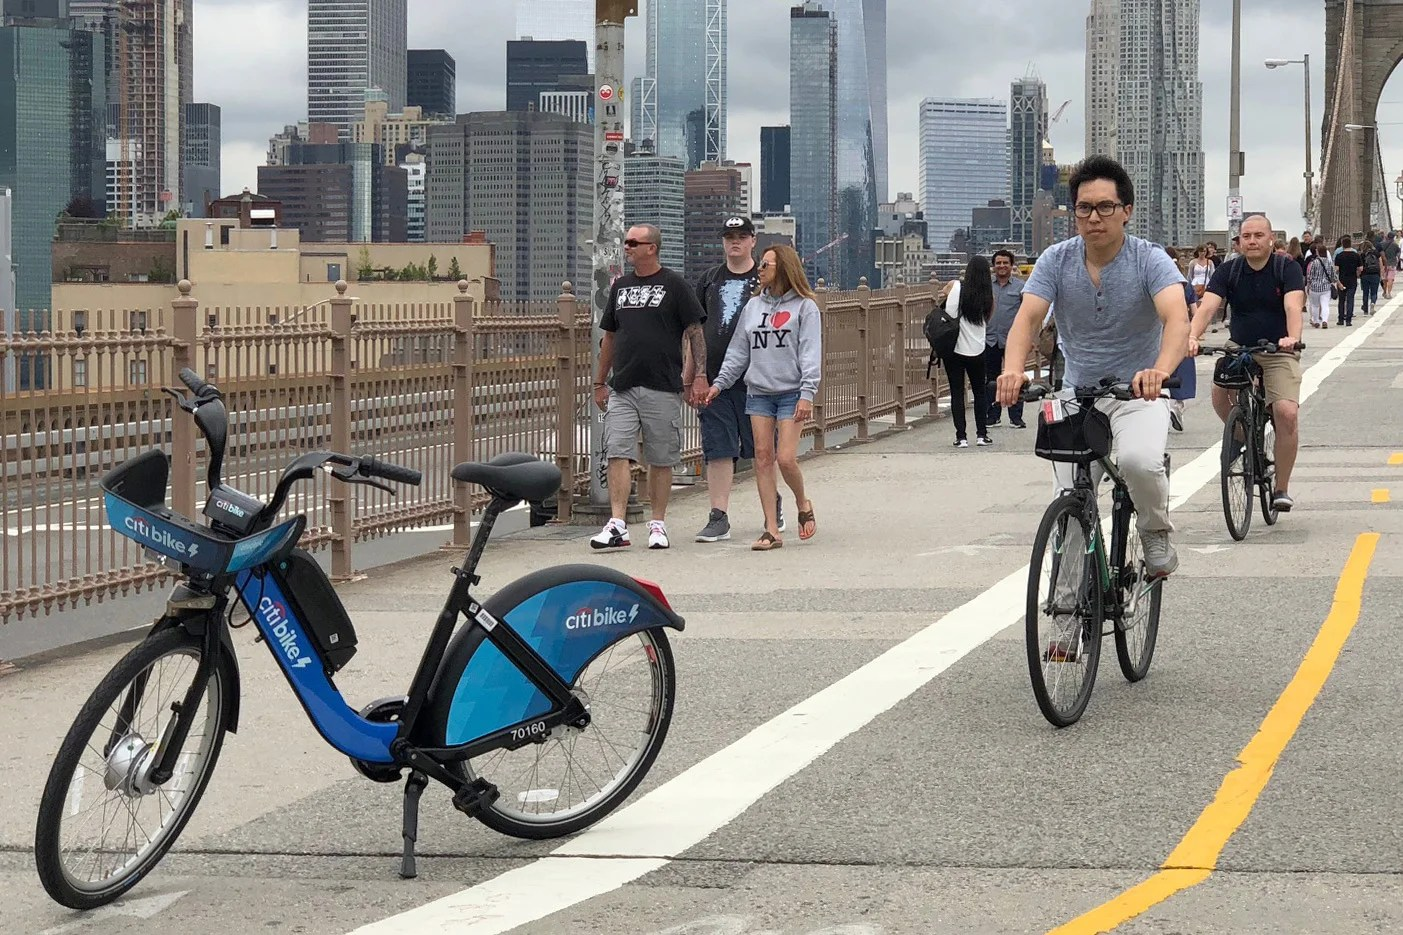 Riding An Electric Citi Bike Across The Brooklyn Bridge